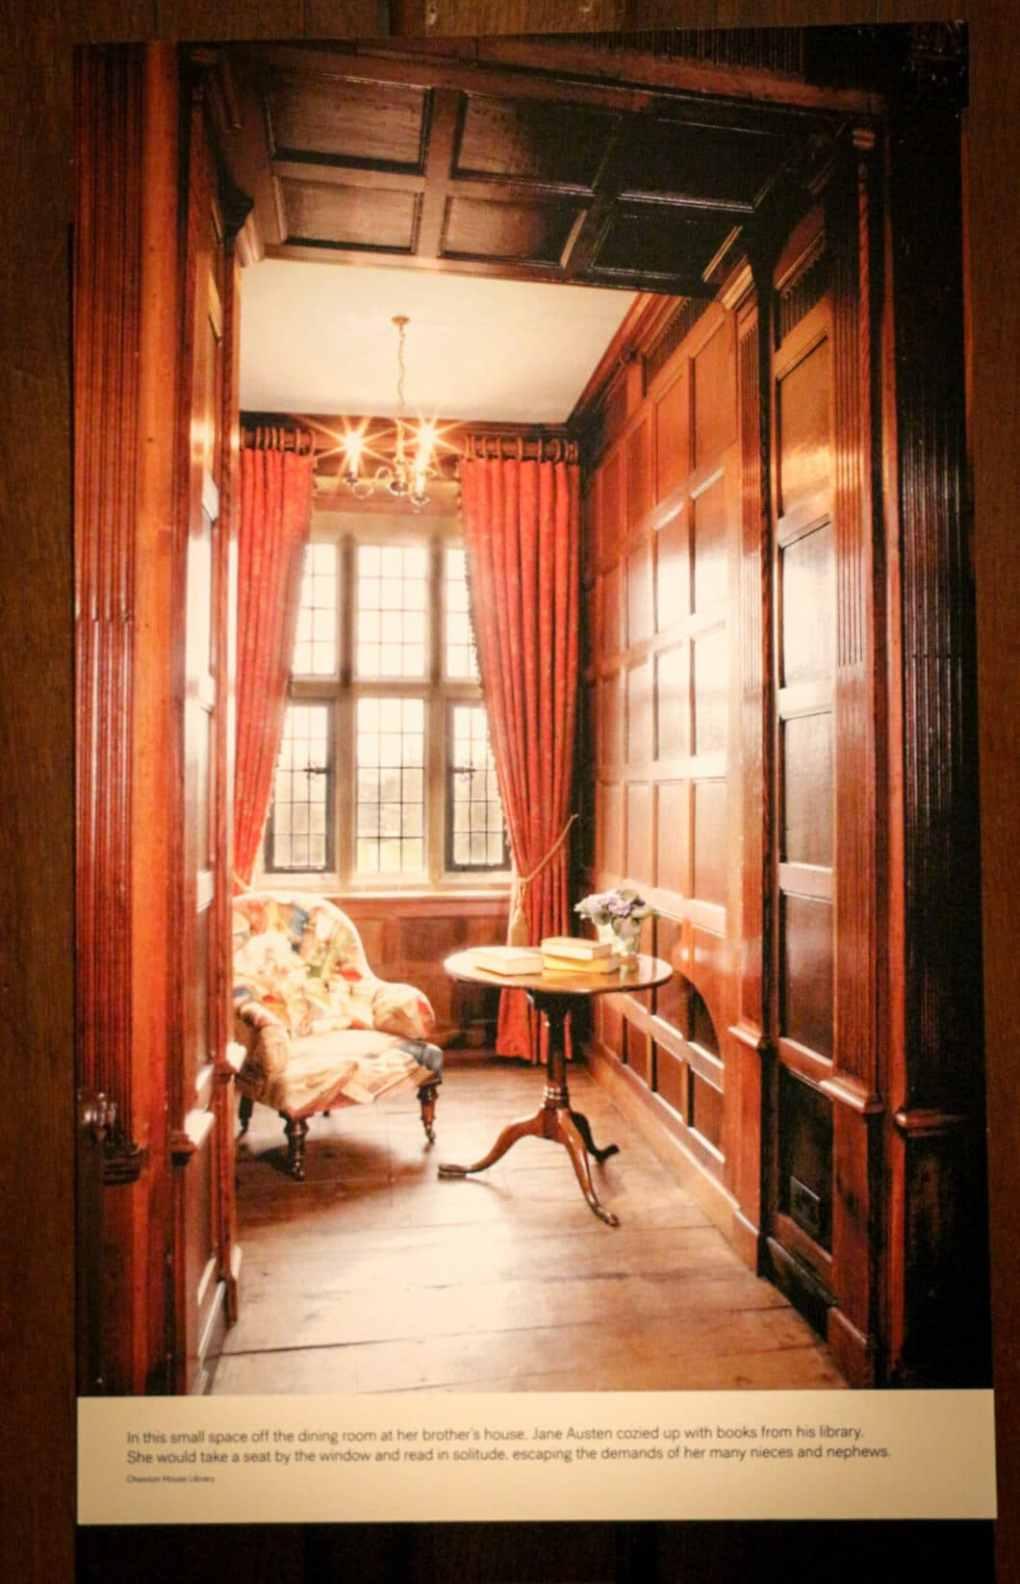 Jane Austen's actual reading room